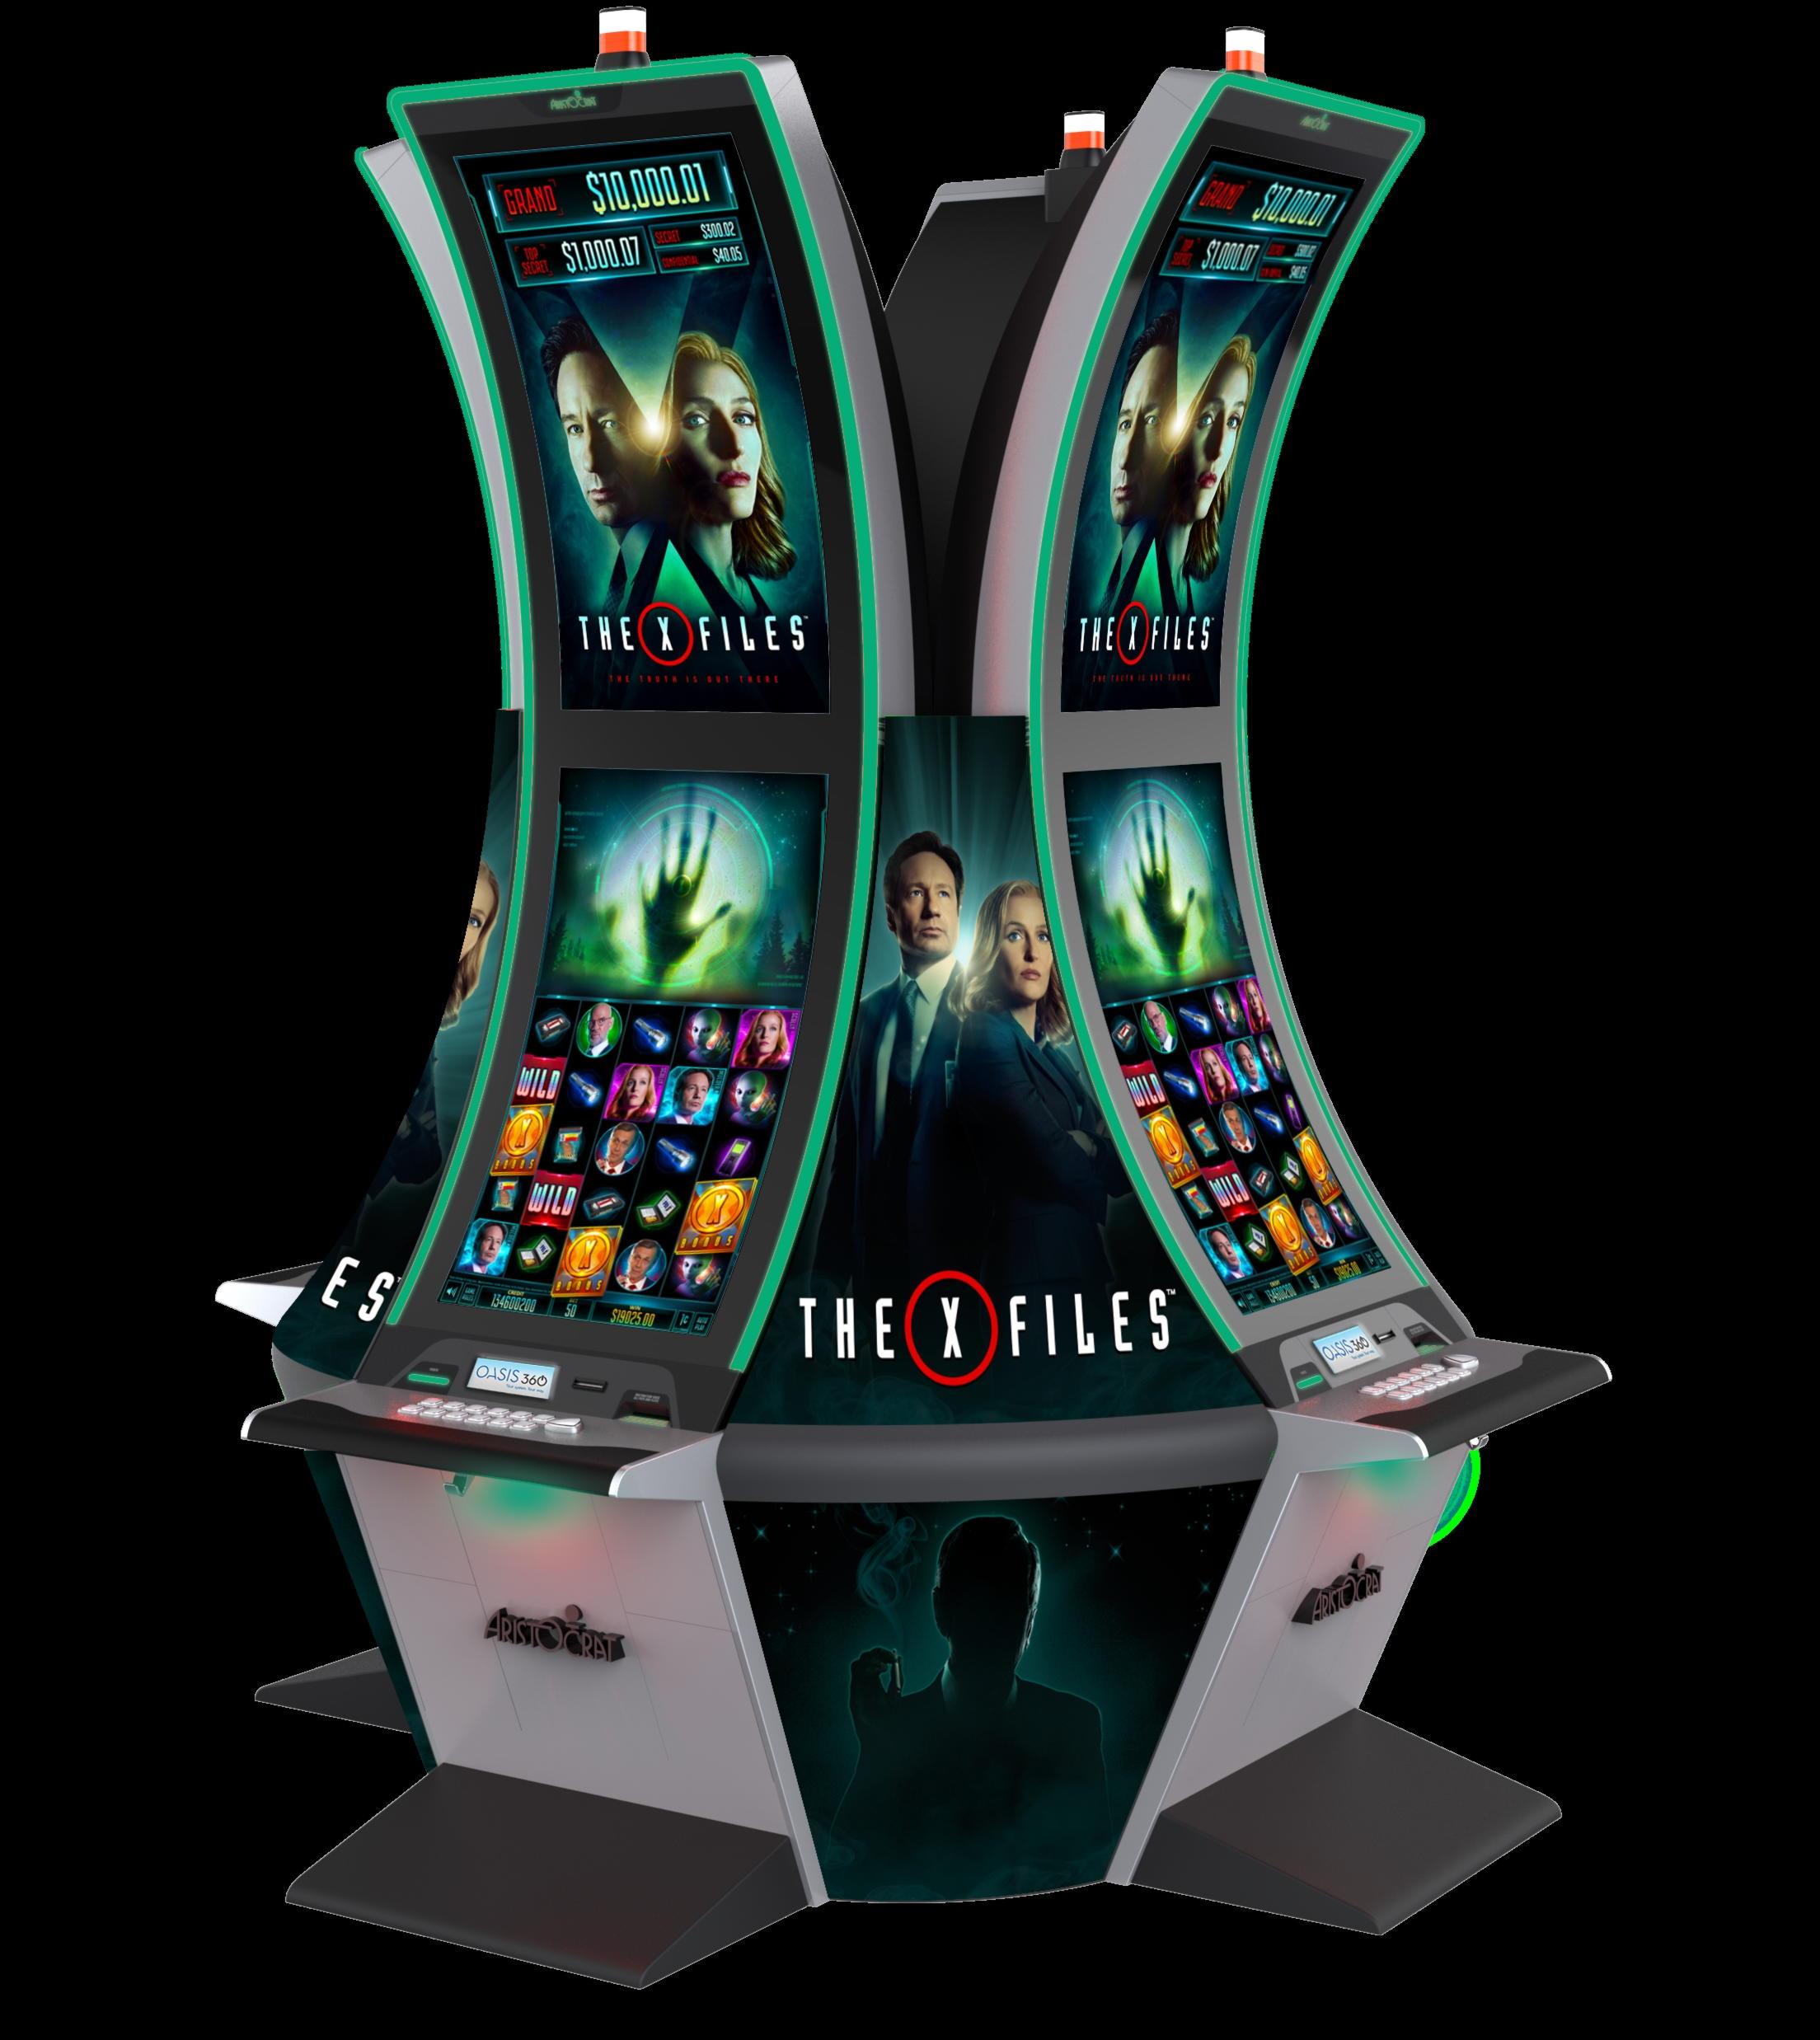 2150 € Ingen indbetalingsbonus på Energy Casino